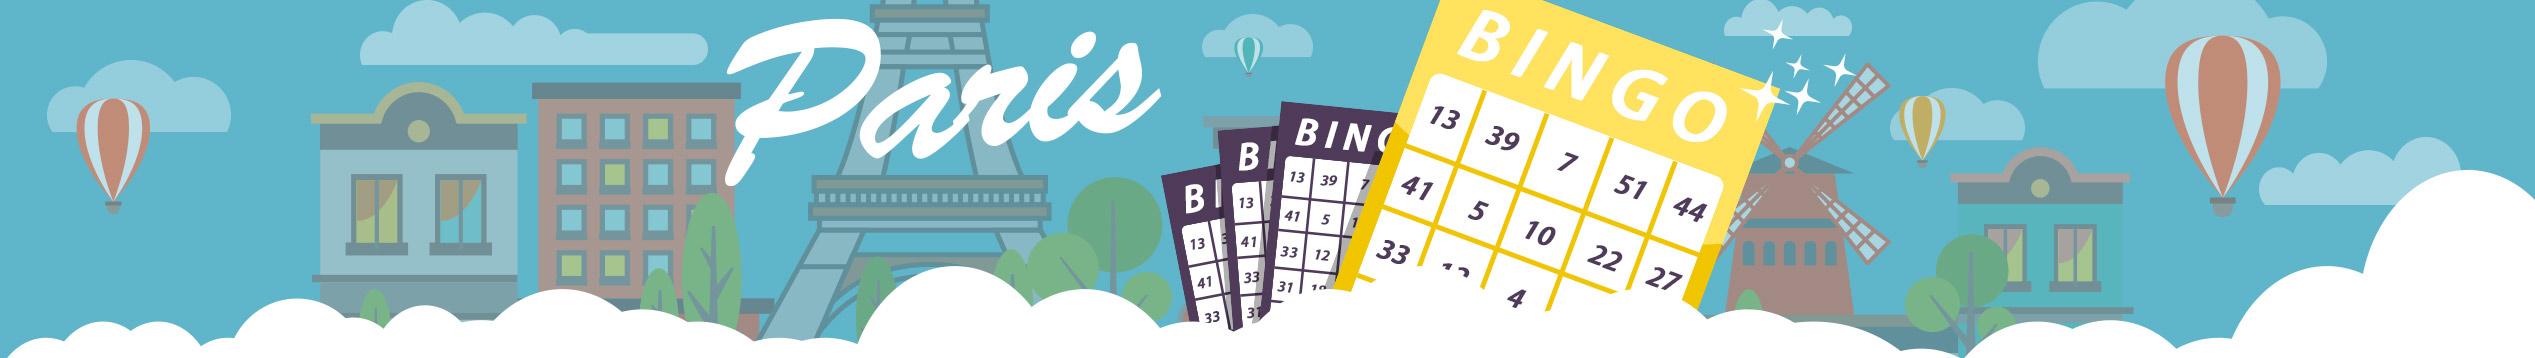 Samla gratisbrickor i bingohallen Paris denna vecka!